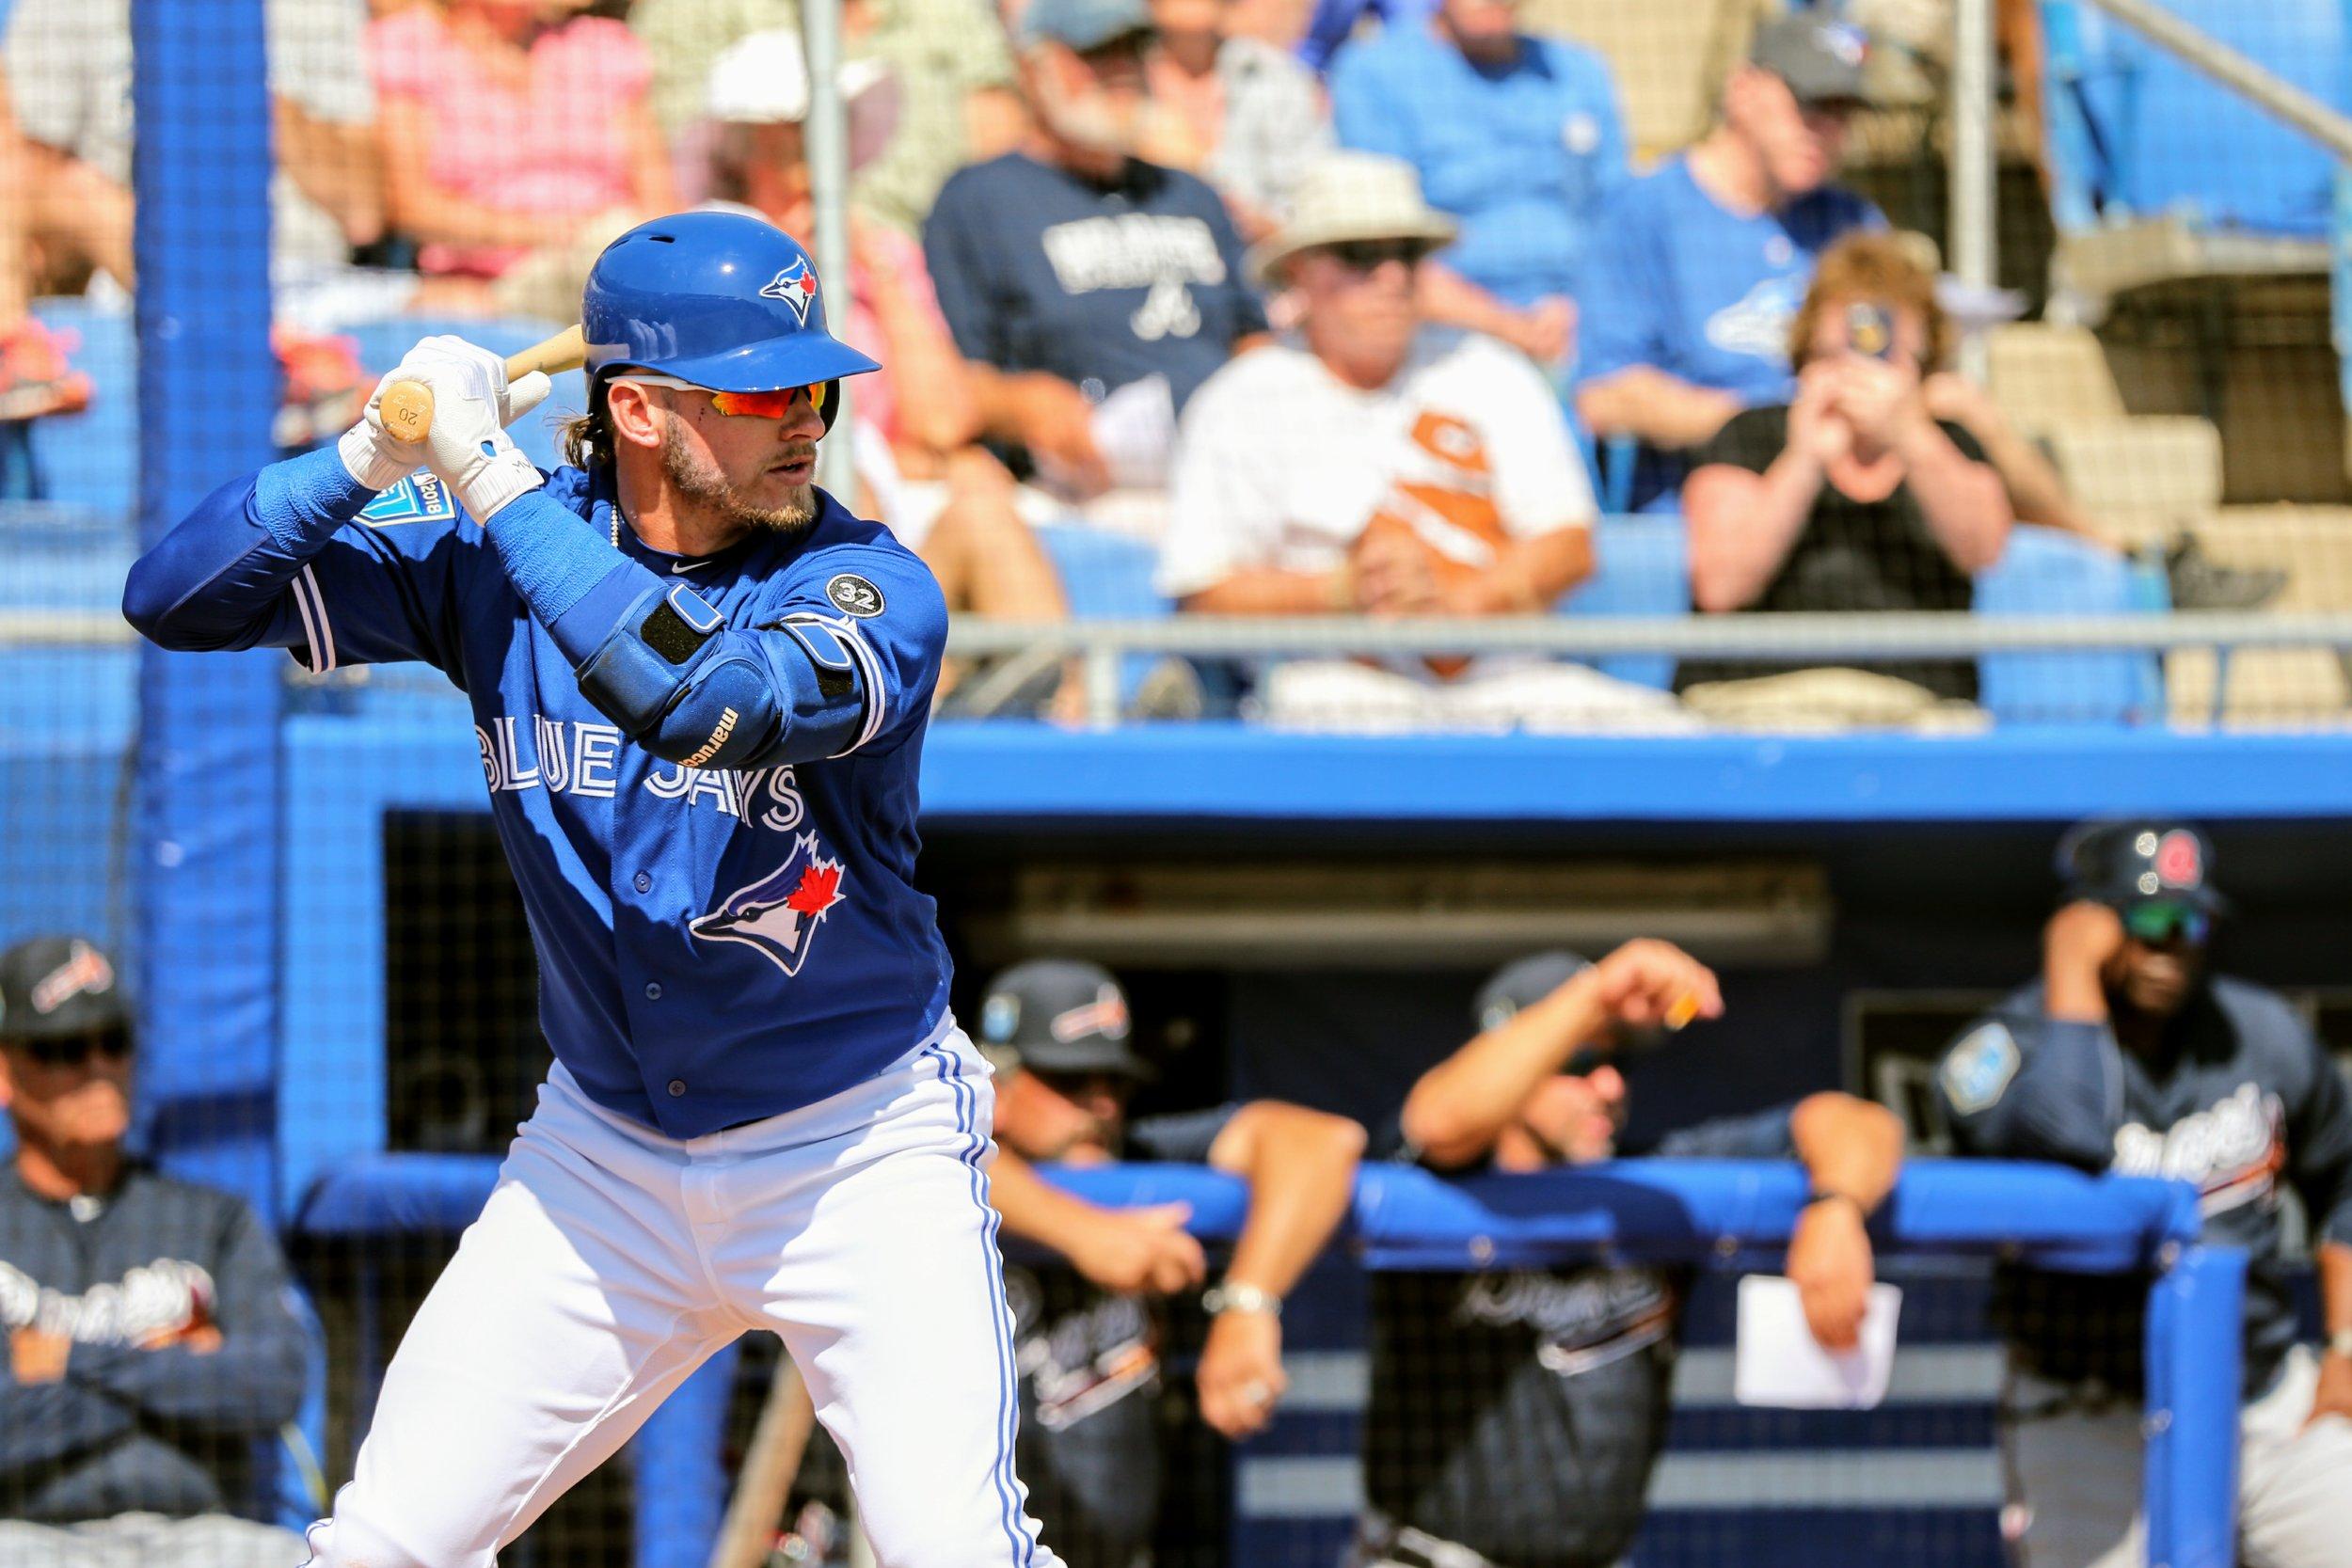 Third baseman Josh Donaldson singled and walked in two at bats.